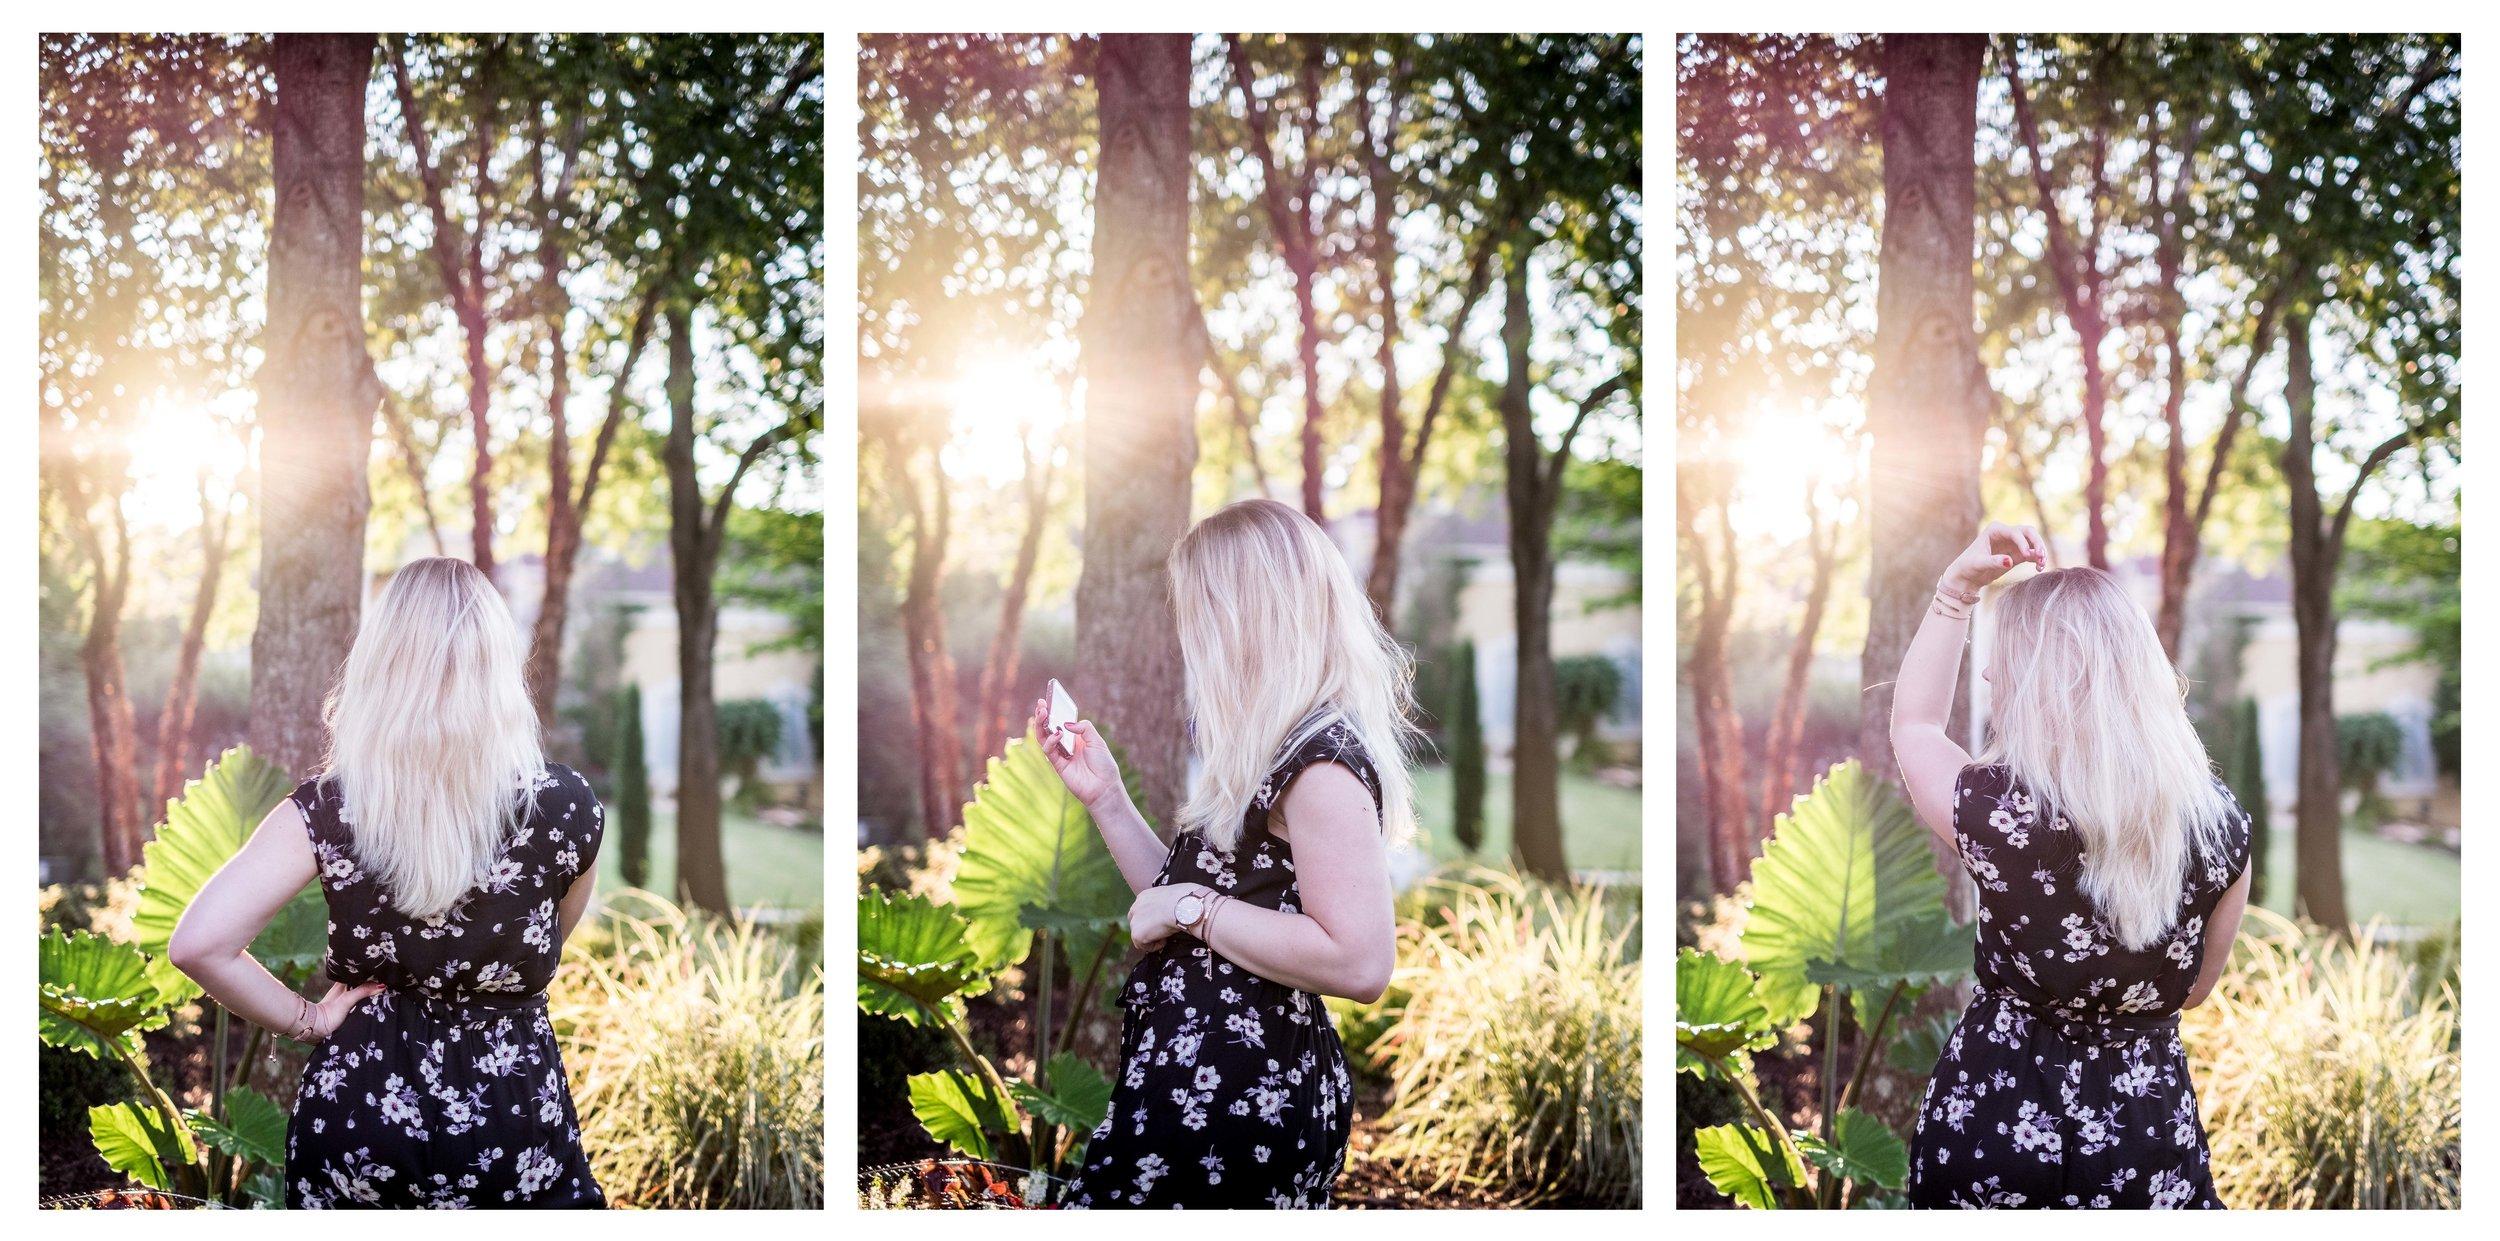 Flower jumpsuit Olivia Vranjes 100.jpg